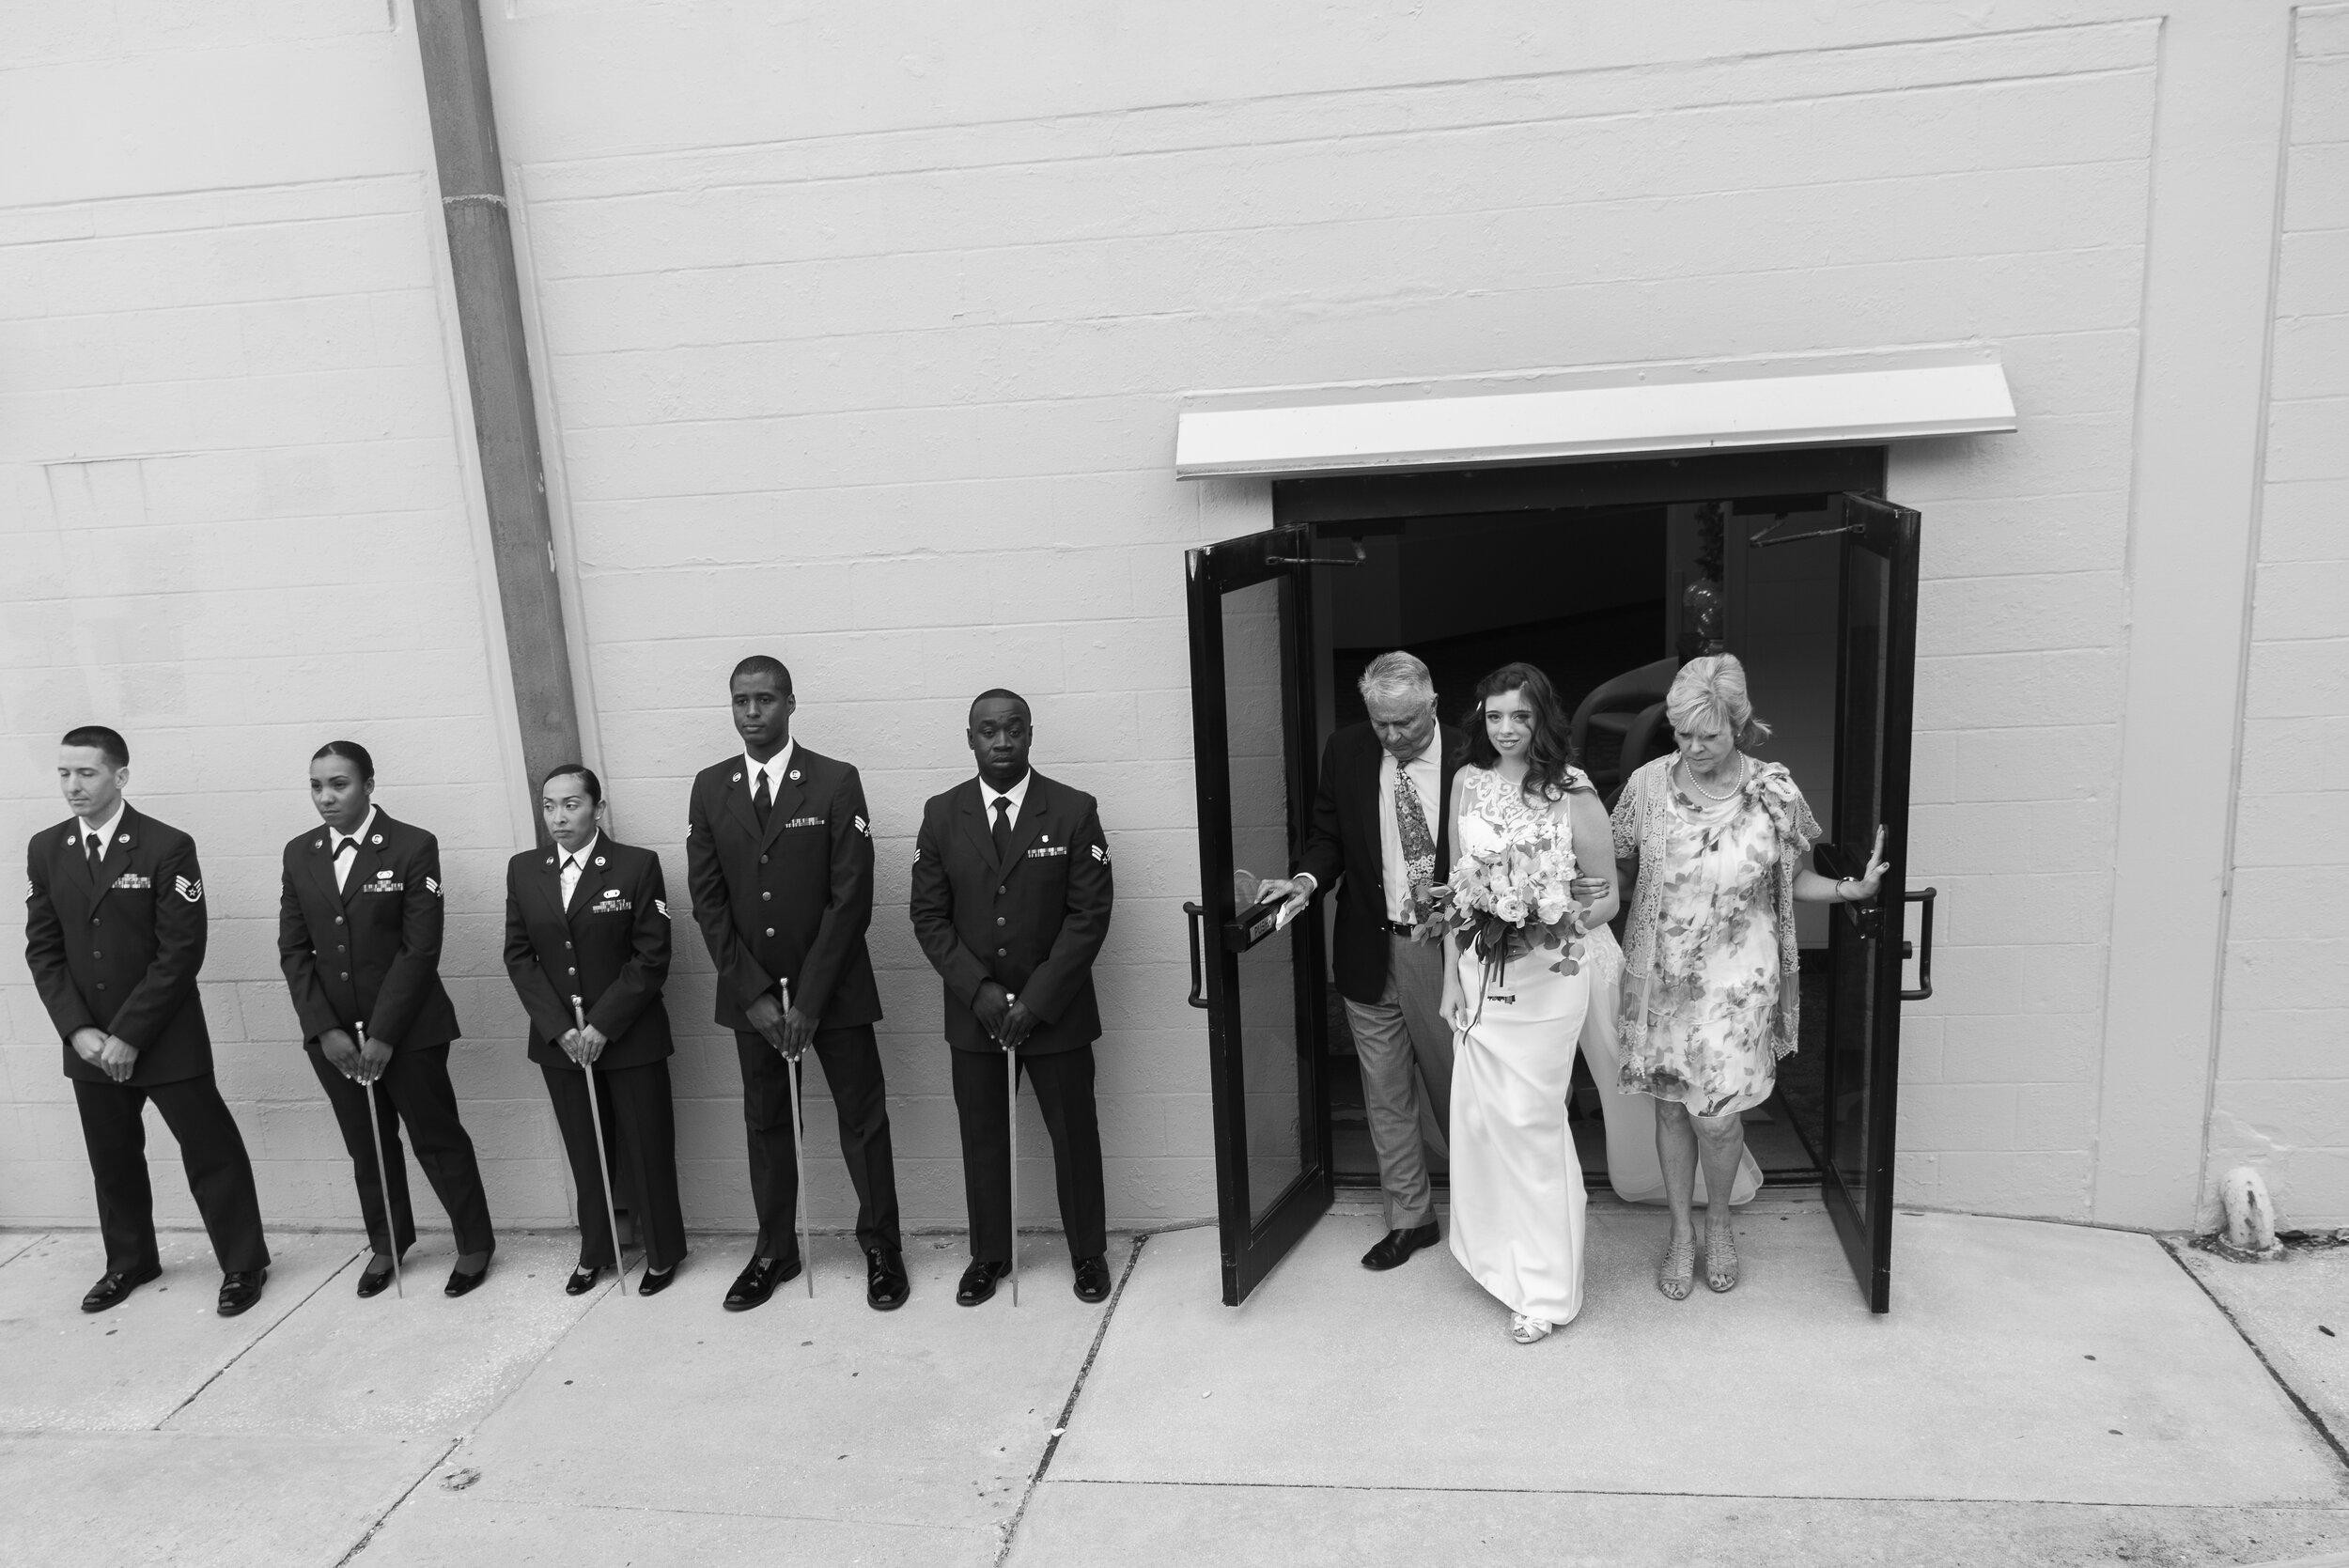 andru-the-tide-club-air-force-wedding-patrickafb-1-31.jpg